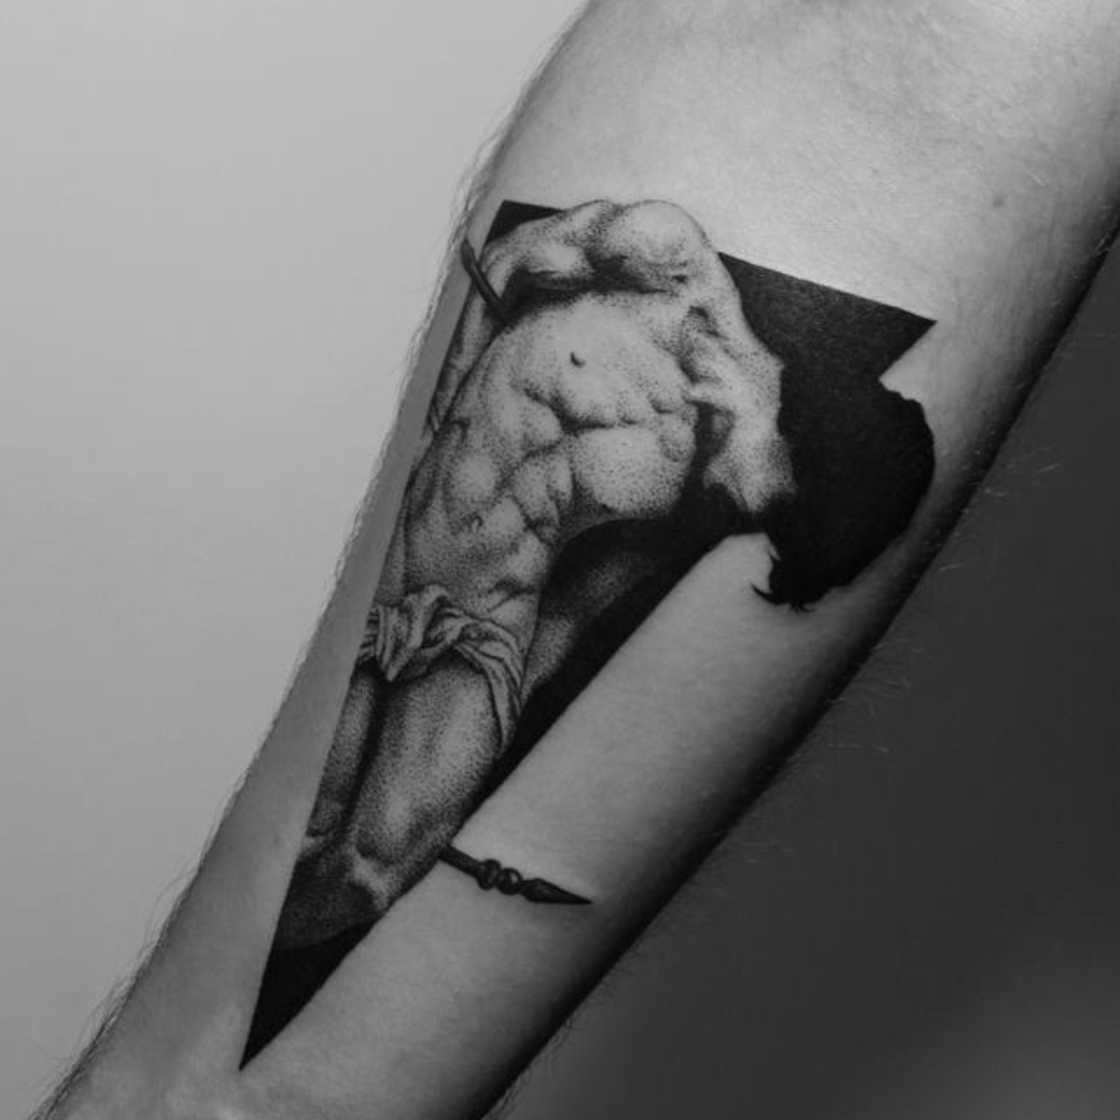 dotyk-dotwork-tattoo-18